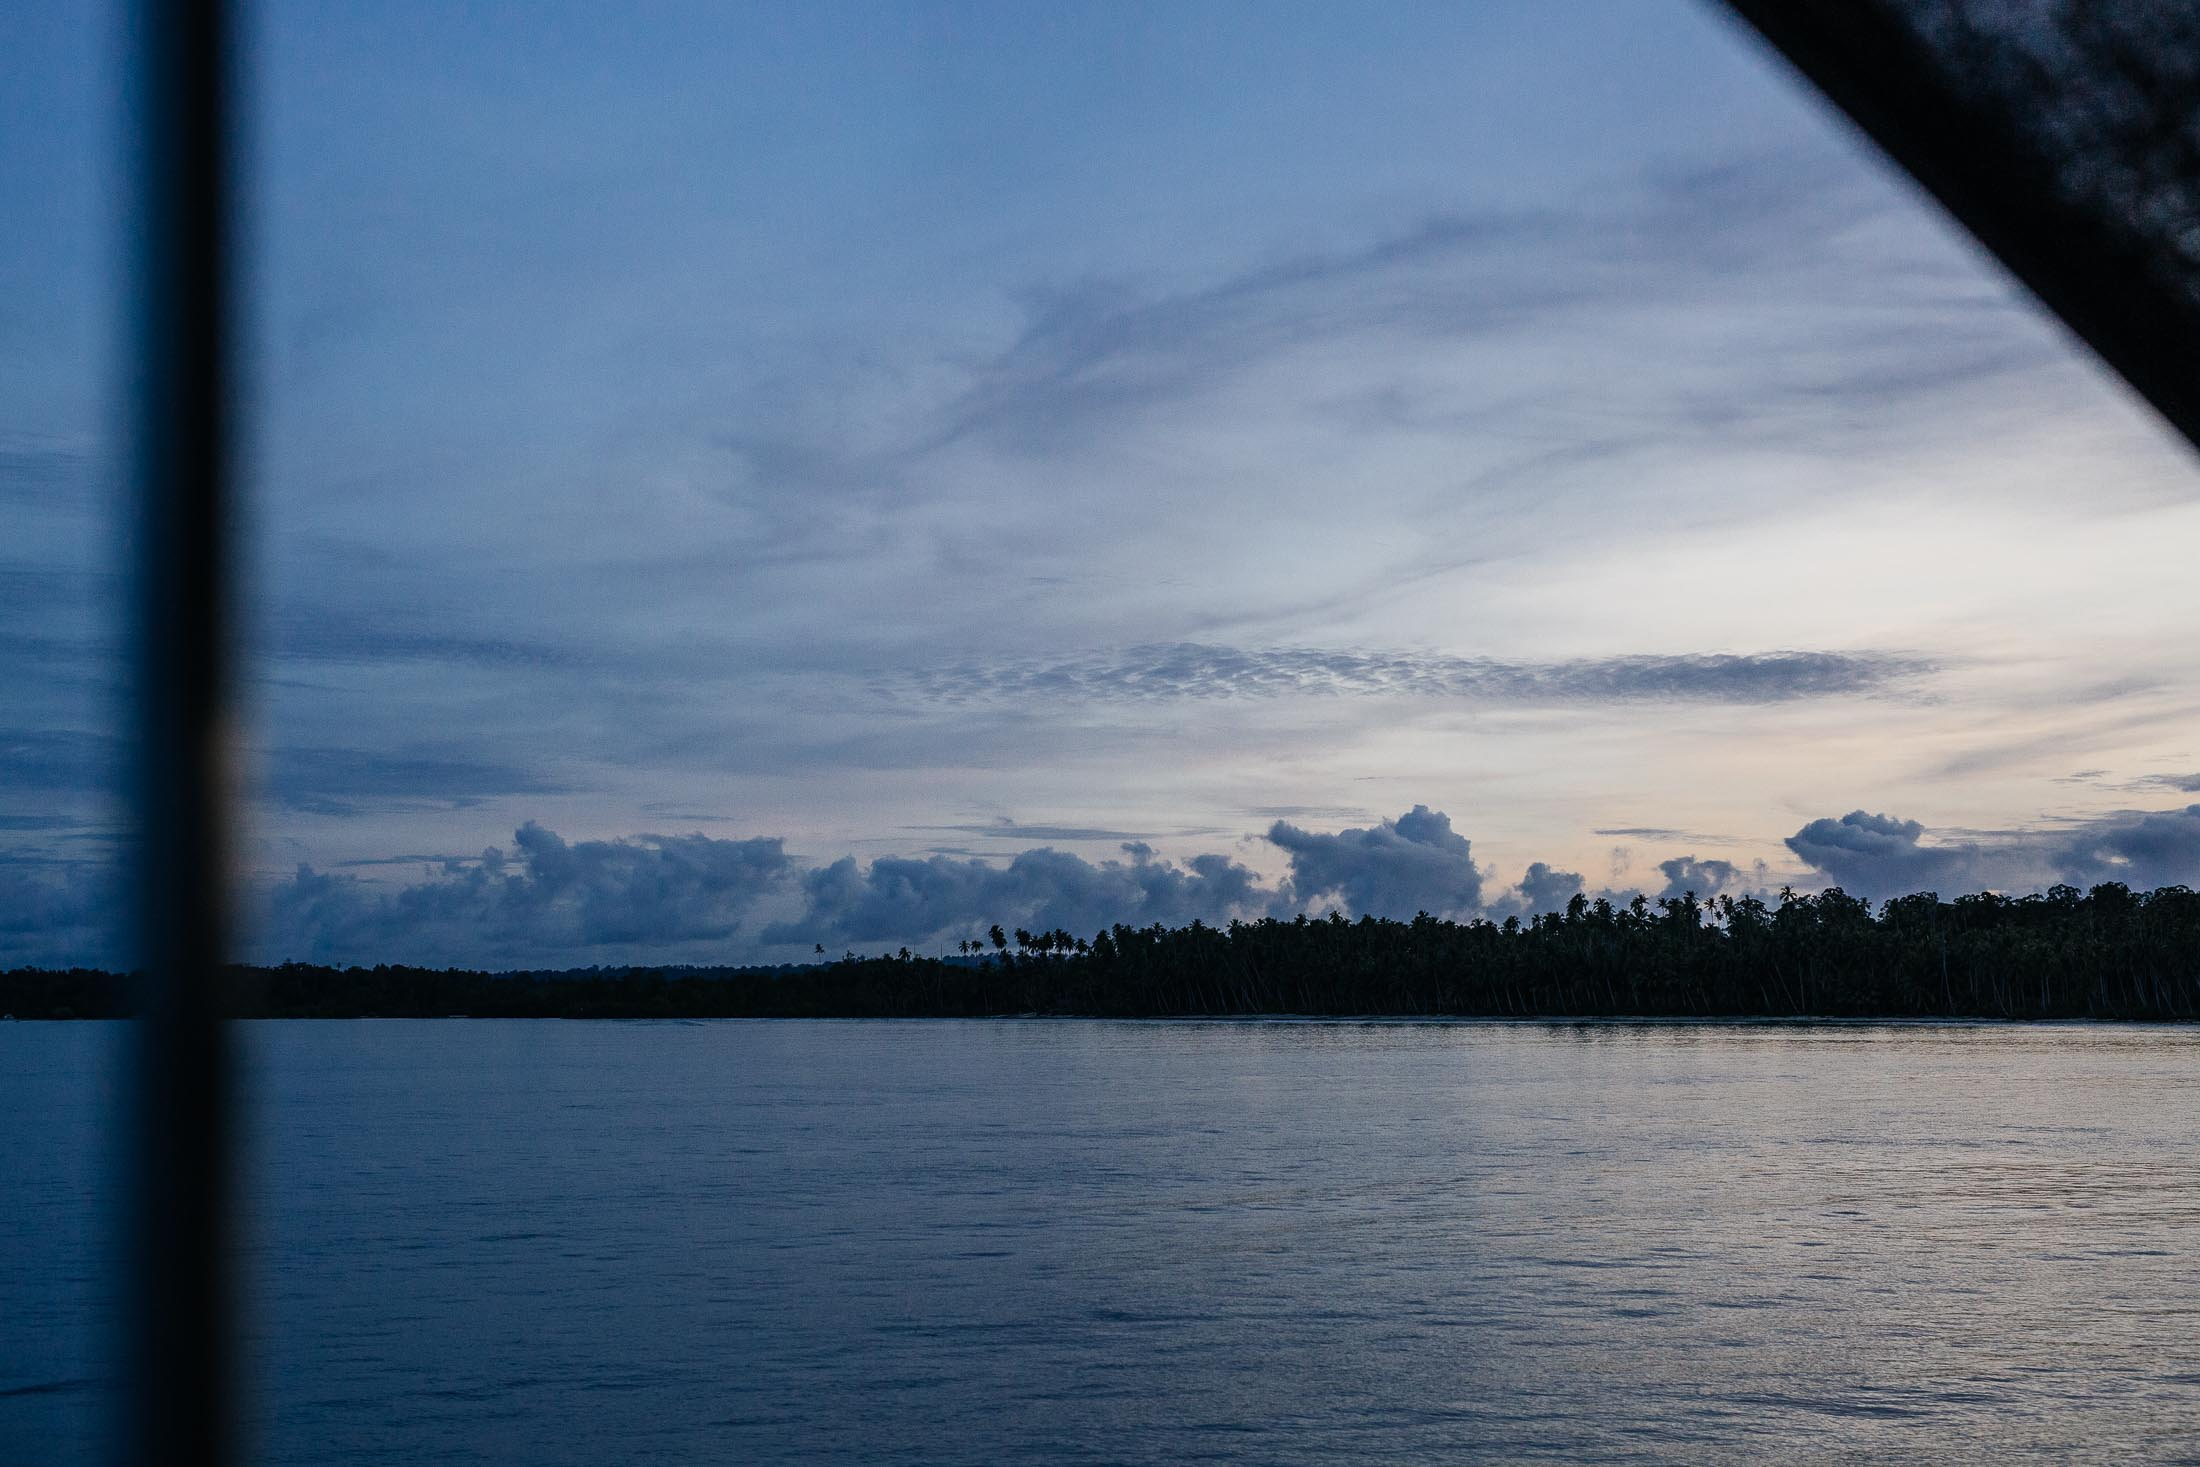 TELO ISLANDS 1